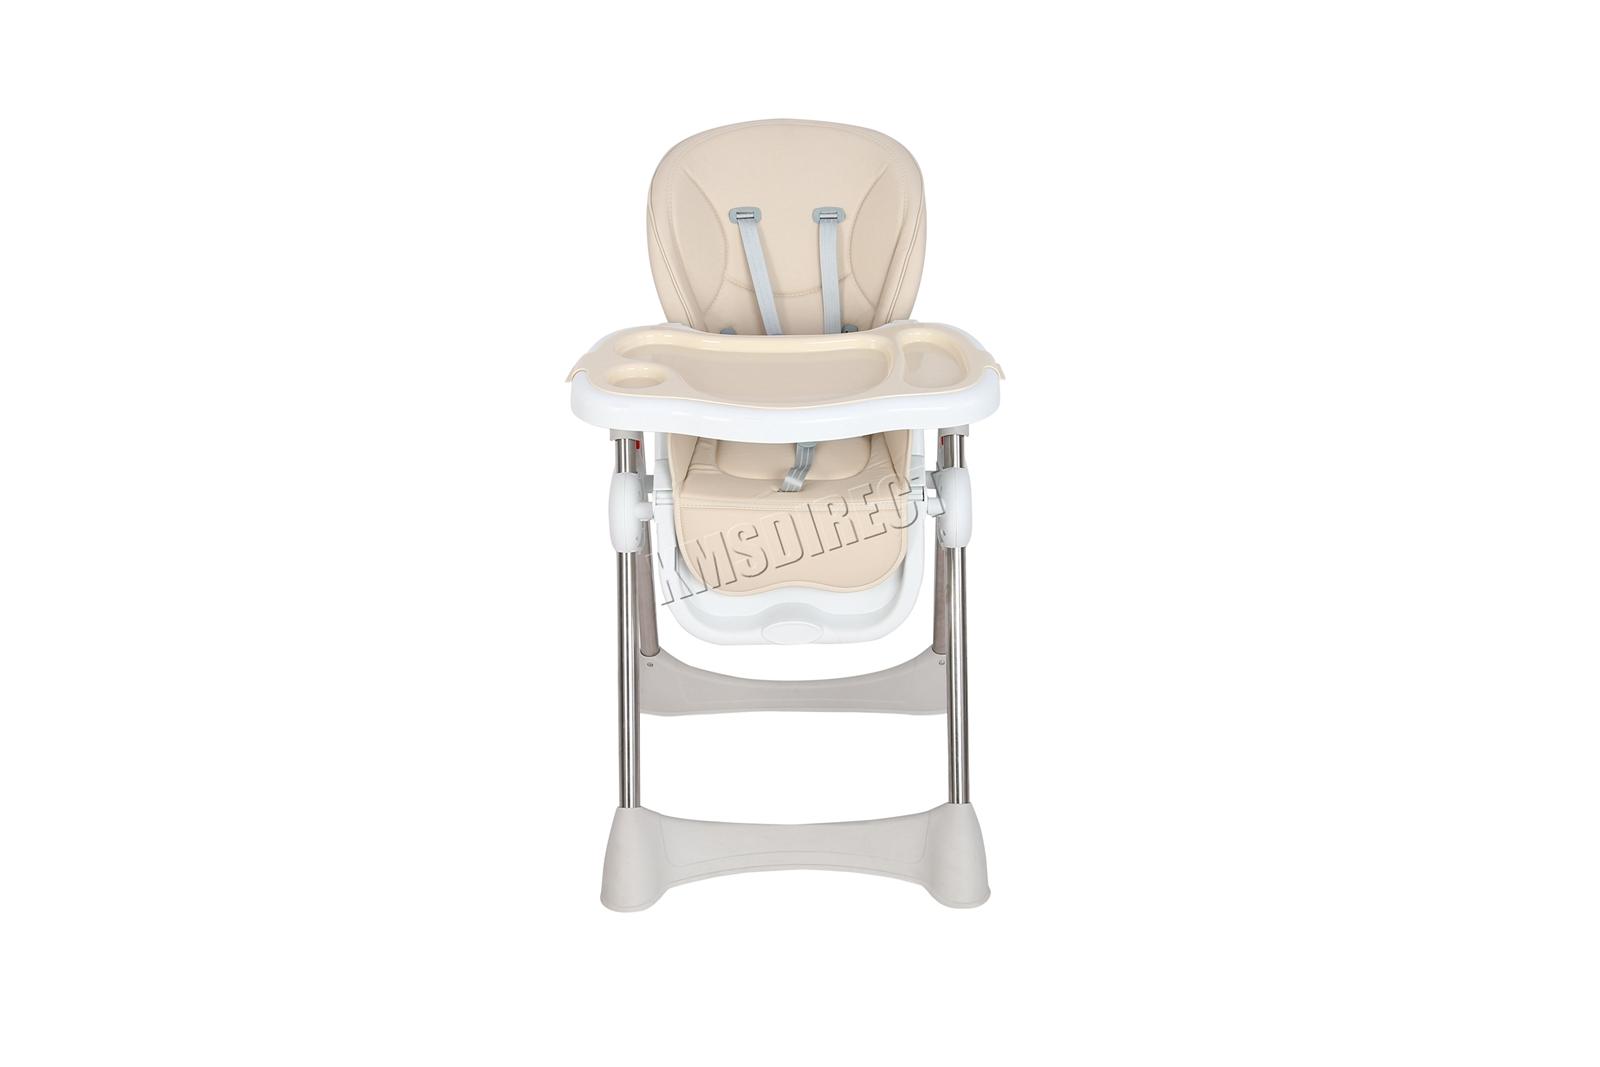 FoxHunter Portable Baby High Chair Infant Soft Leather Feeding Nursery BHC04